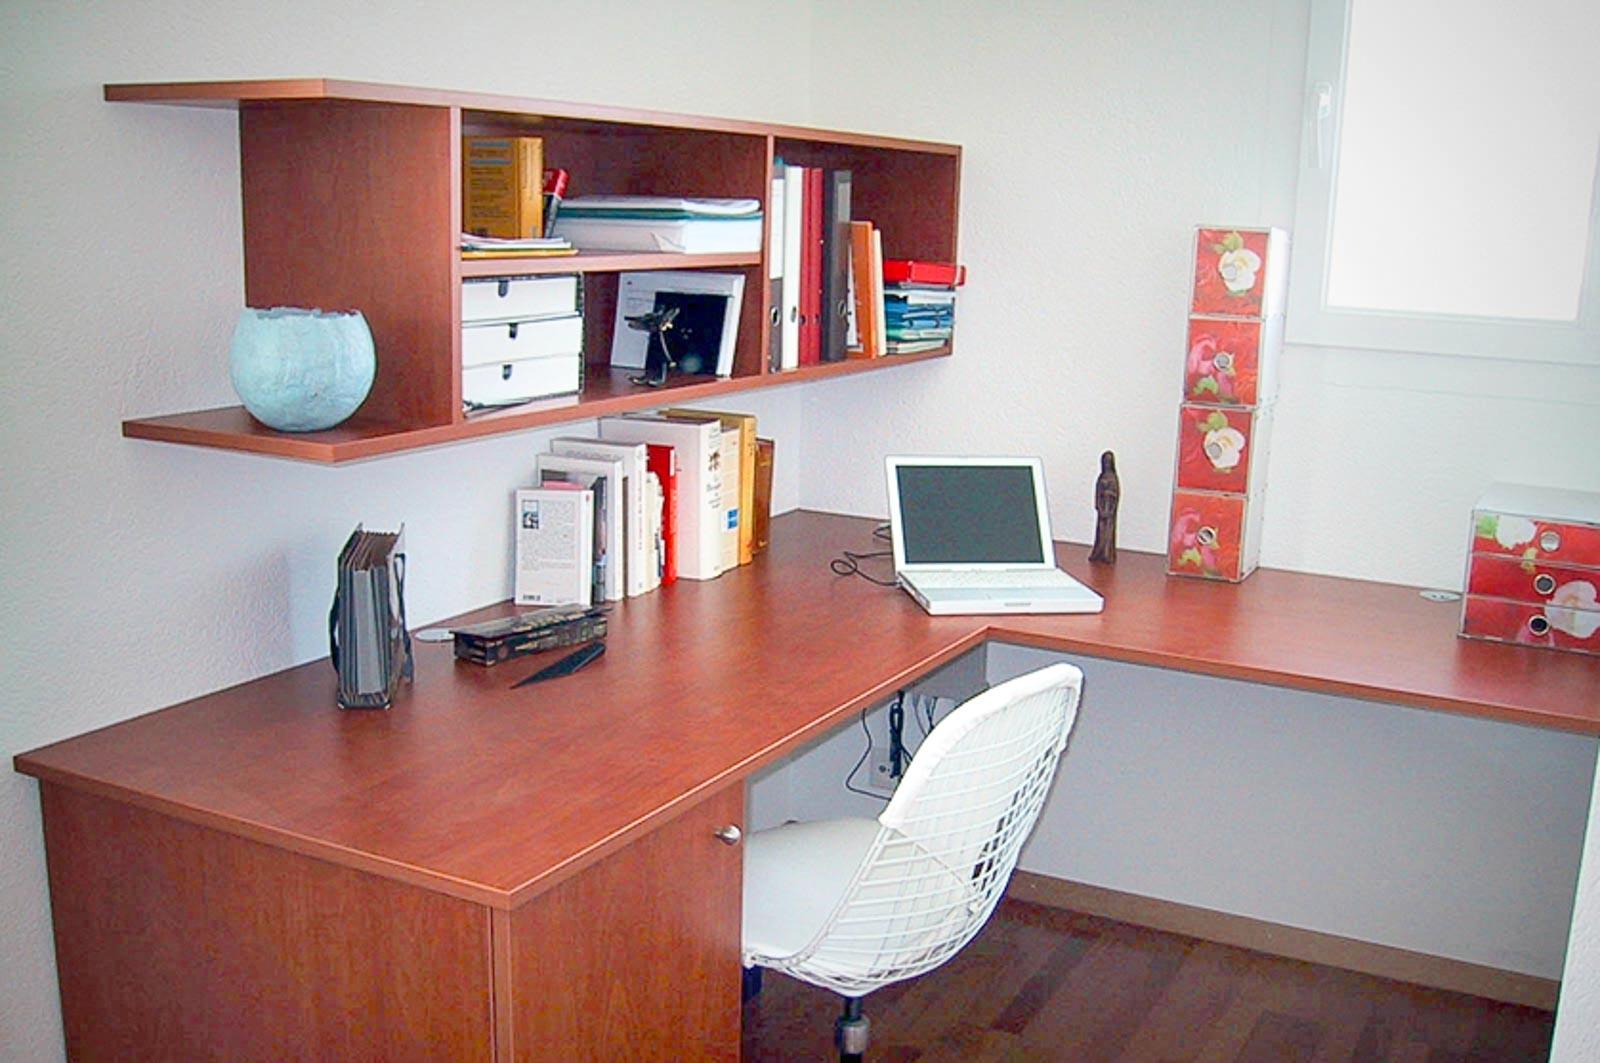 Wooddesign_Büro_Homeoffice_Schreibtisch_Regal_Holz